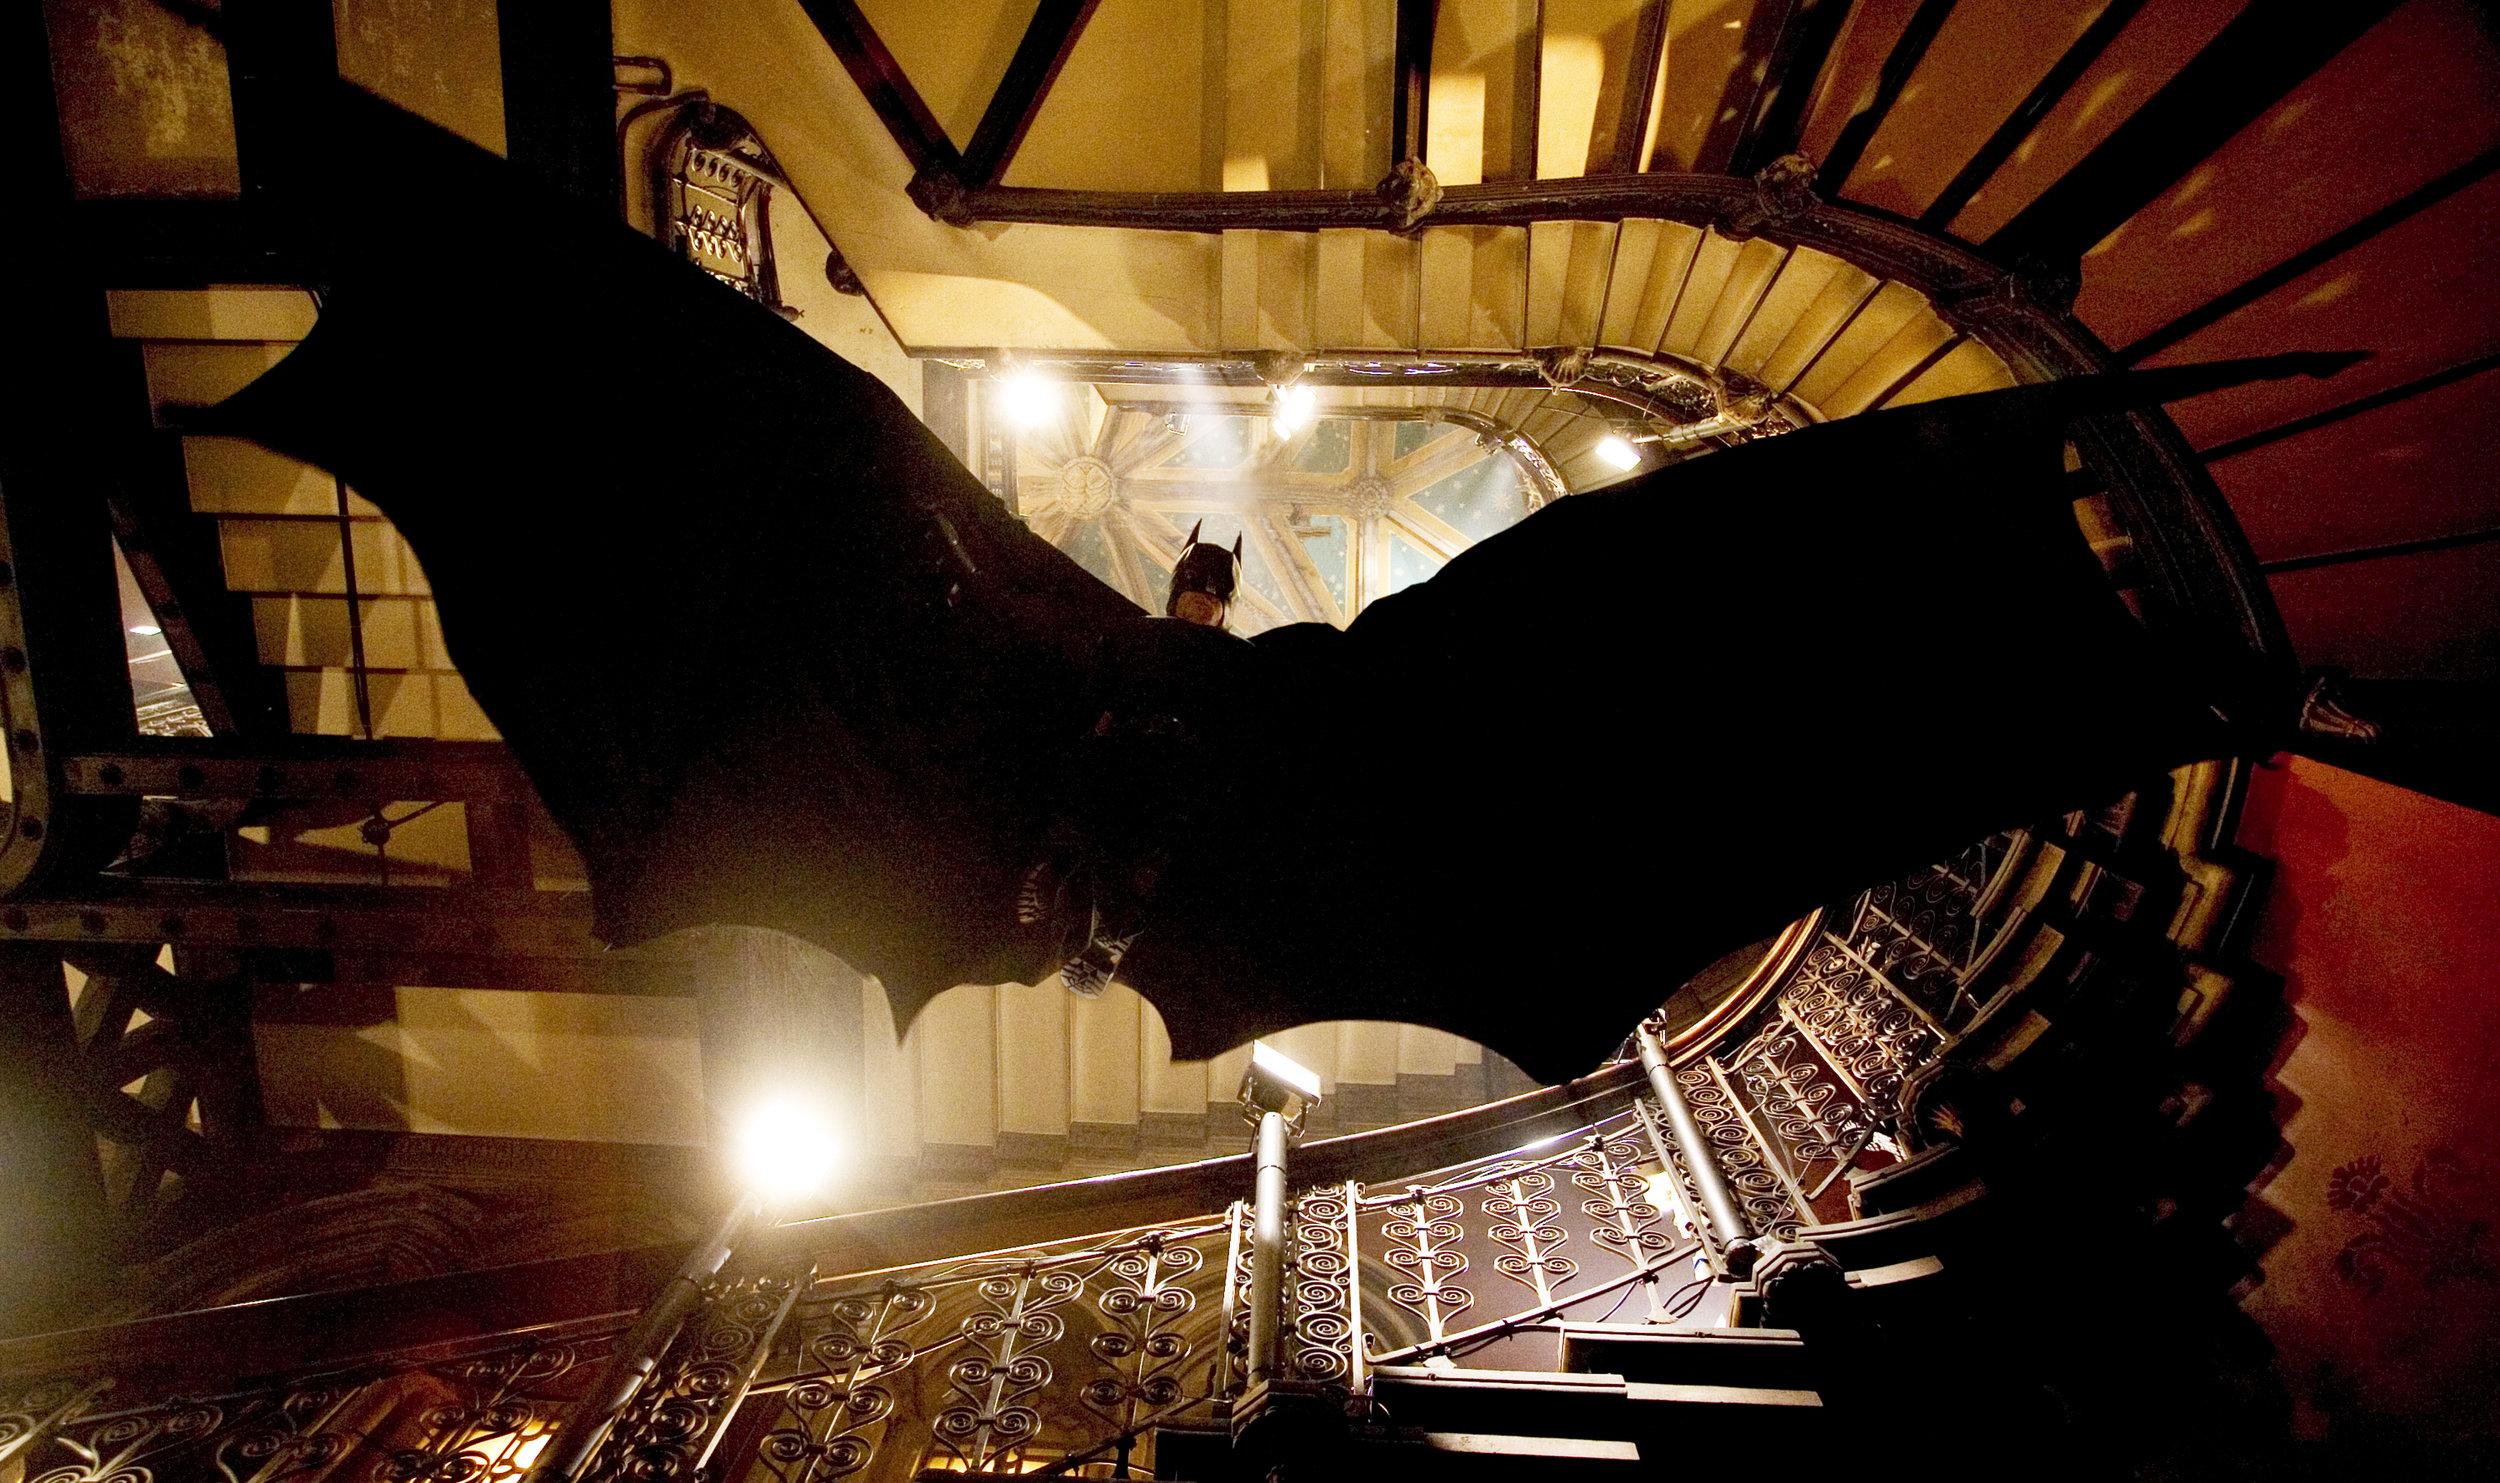 The Dark Knight Trilogy on IMAX 15/70MM Film